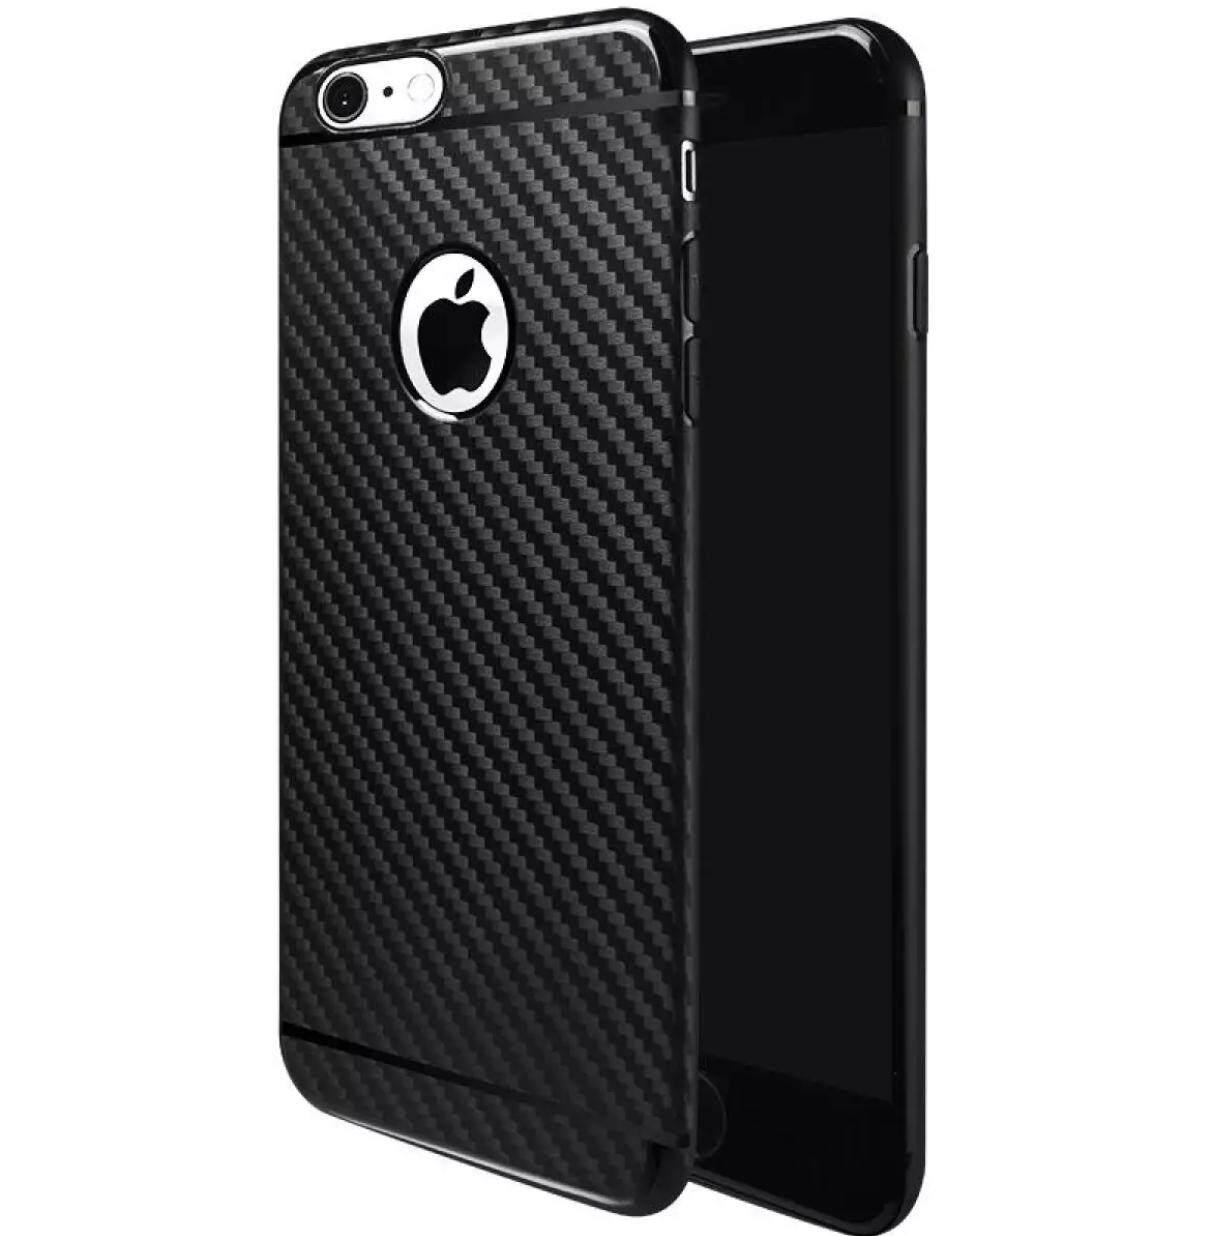 Iphone เคสเคฟร่า Hoco แท้ ไอโฟนทุกรุ่น Iphone Xs Max,xr, Xs,x,i8, 8plus,i7, 7plus, 6s,6splus,i6,6plus,i5,5s,se.